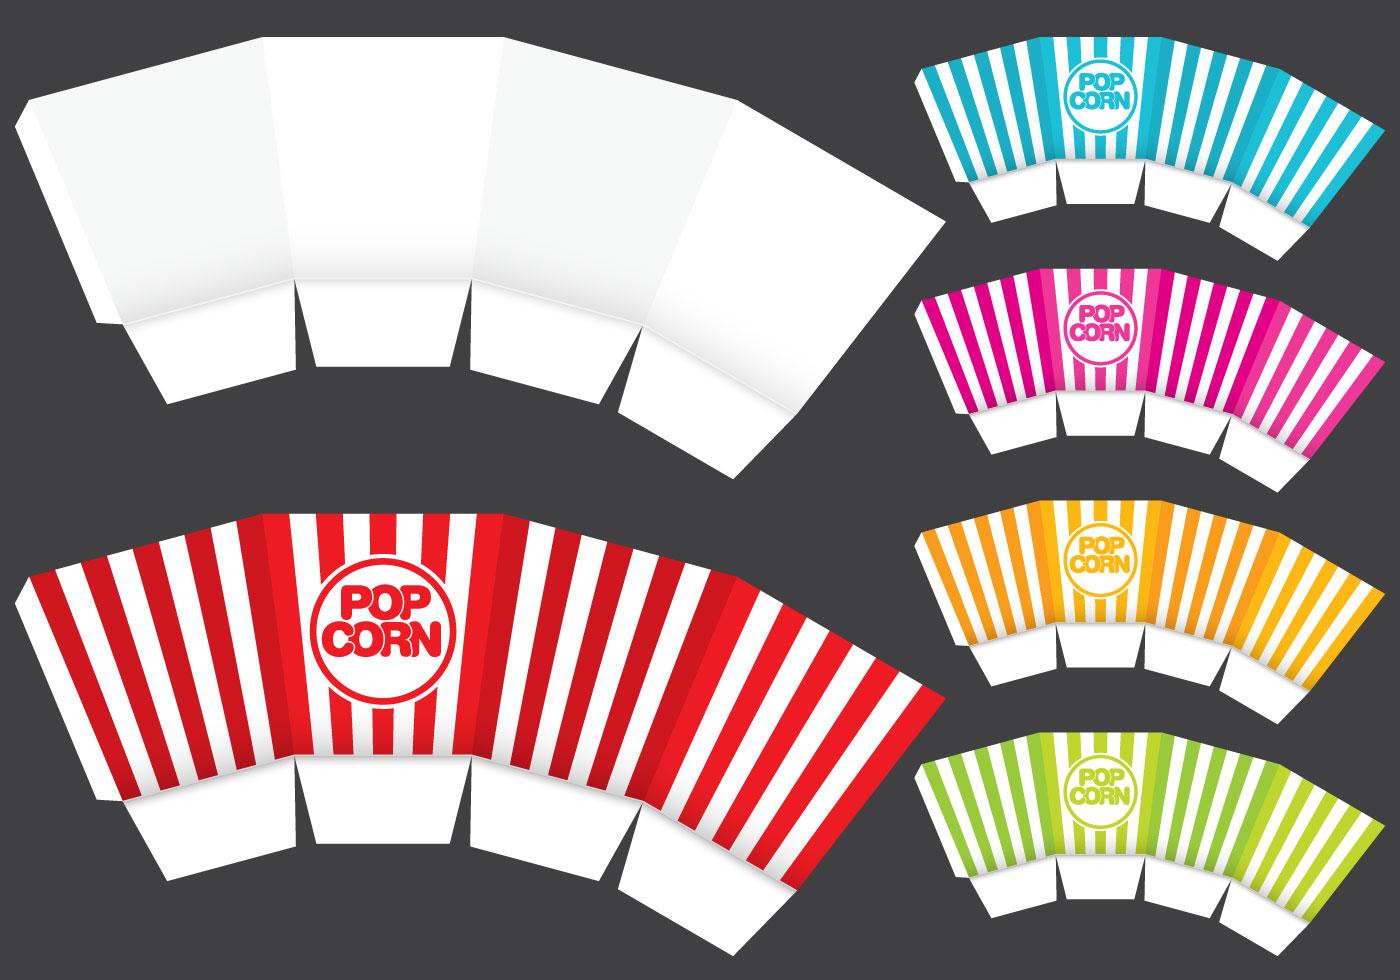 Popcorn Box Template - Download Free Vector Art, Stock Graphics ...